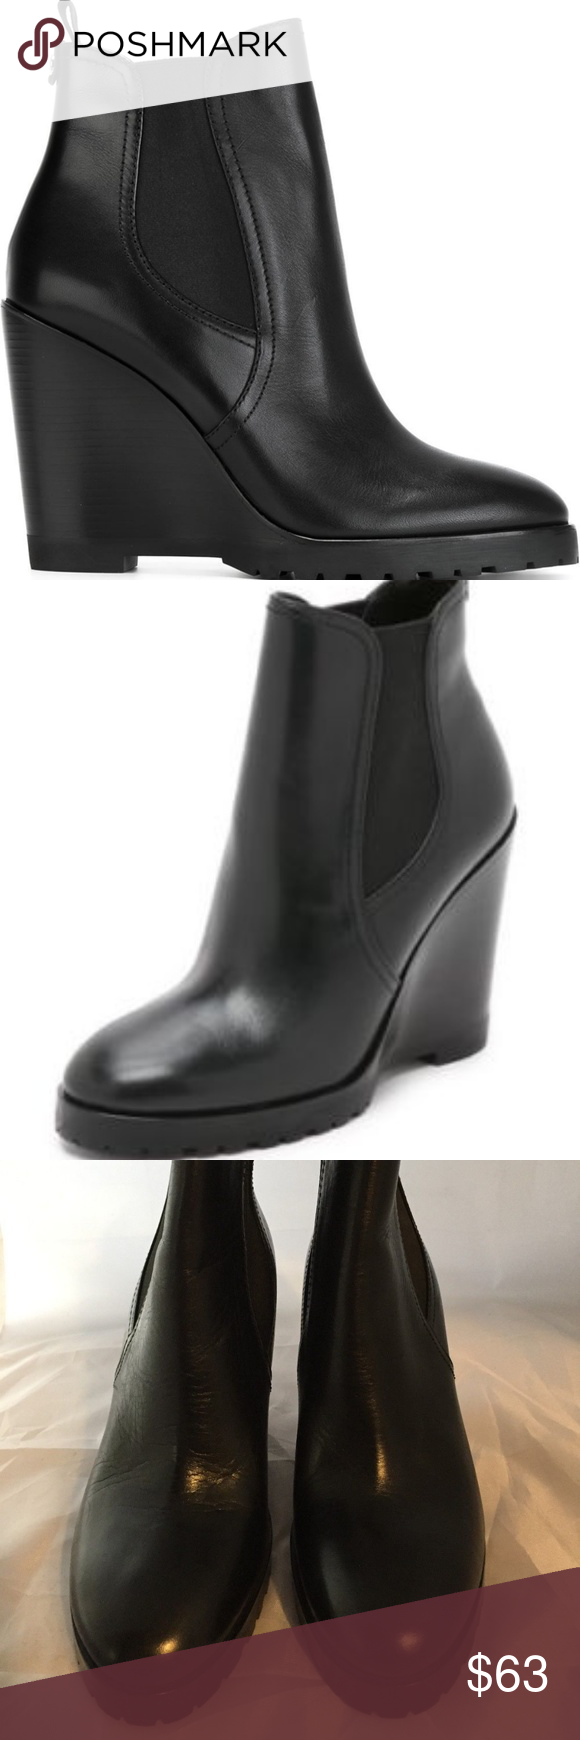 cd09c1512f8 NEW MICHAEL Michael Kors Thea Wedge Boots Blk